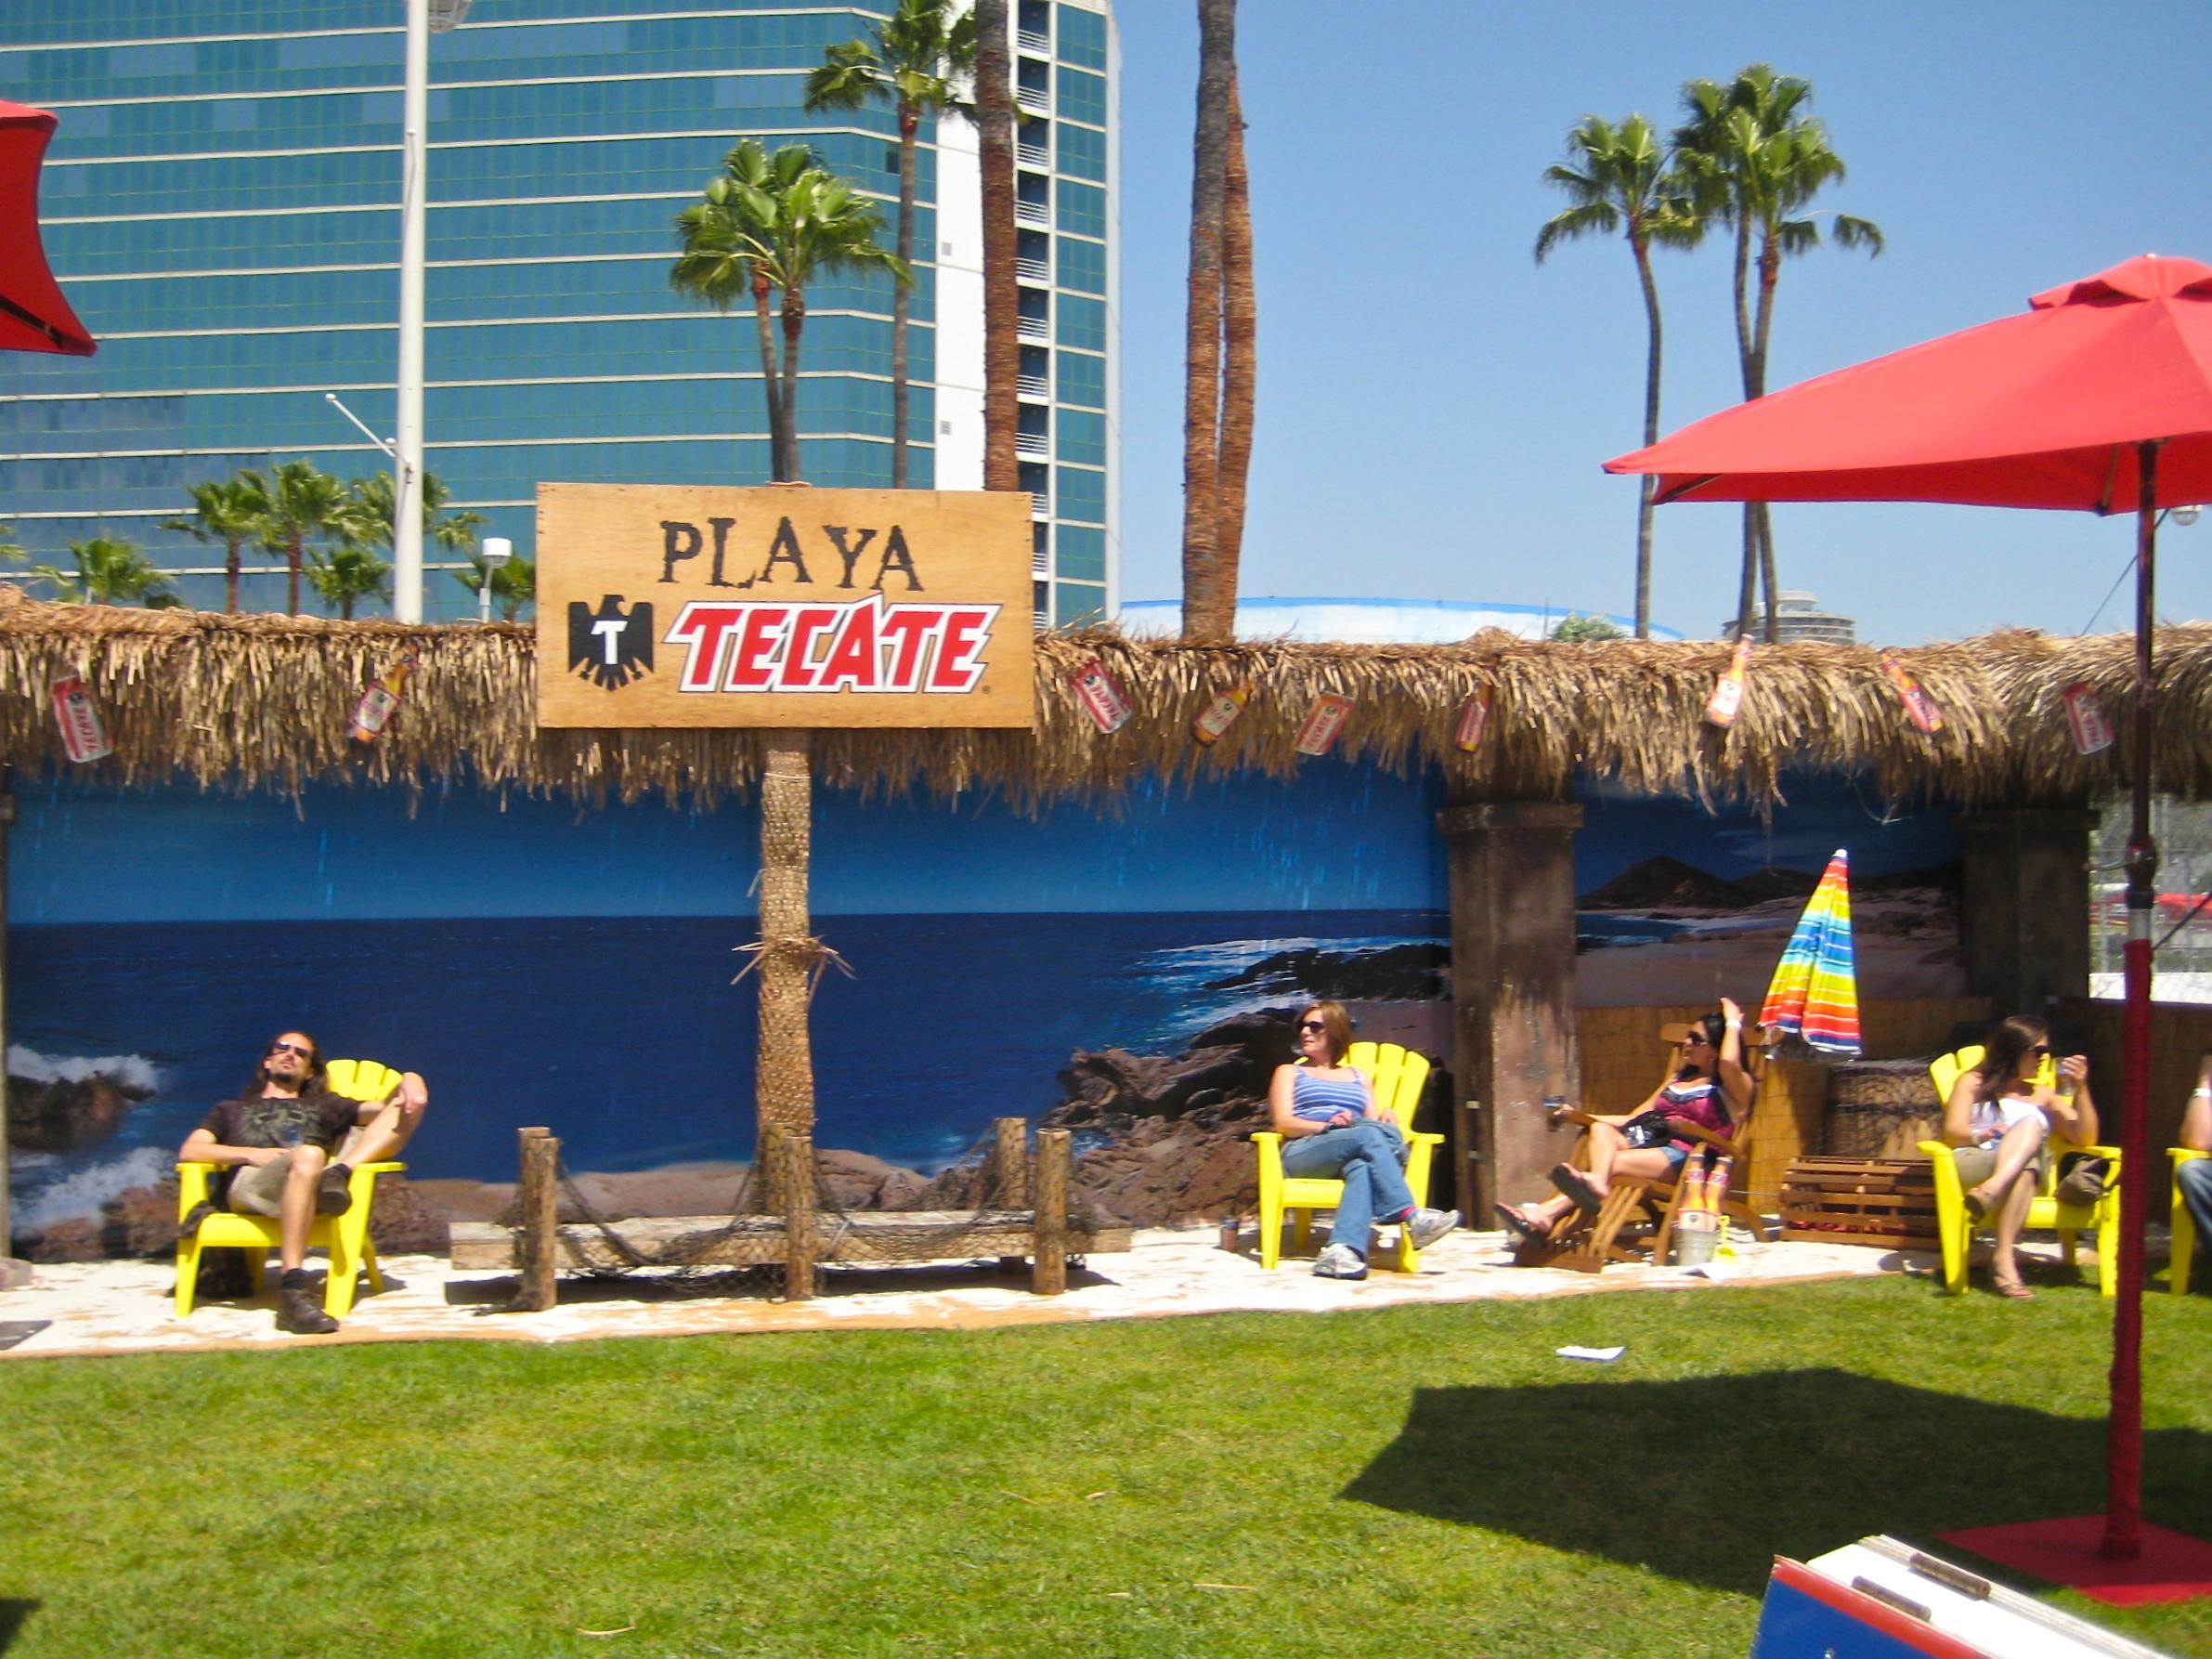 Playa Tecate